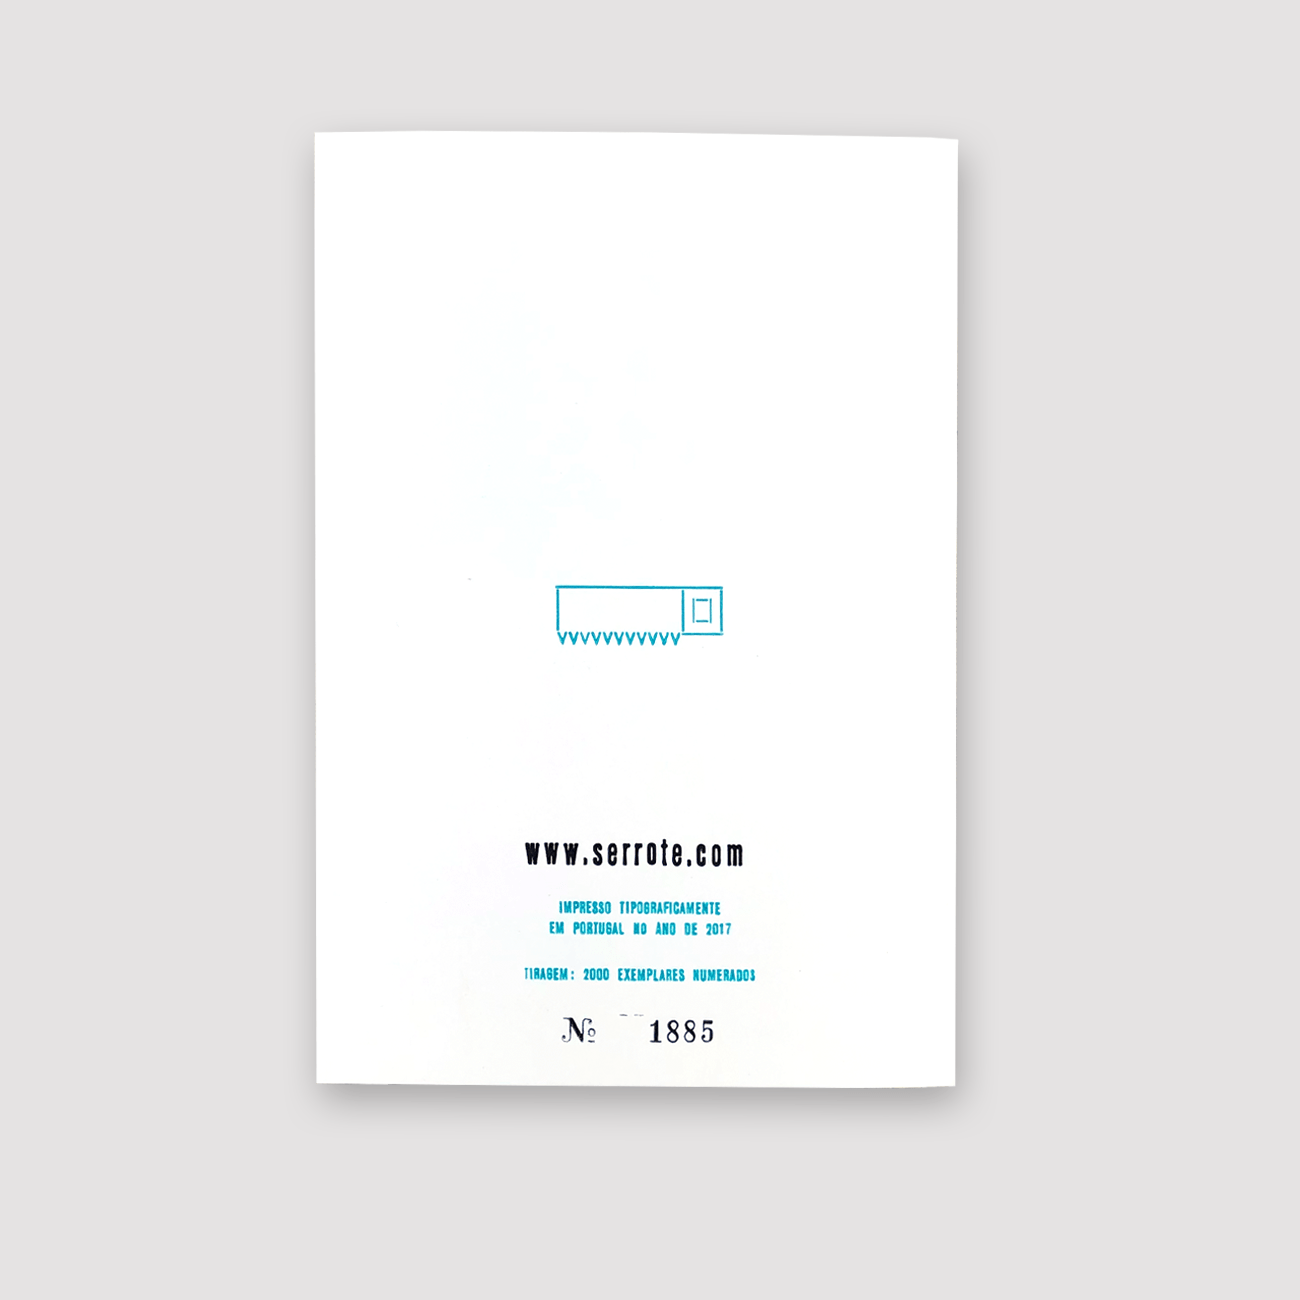 Serrote Notebook, Papel Esquico, Rückseite, Buchdruck, limitiert,